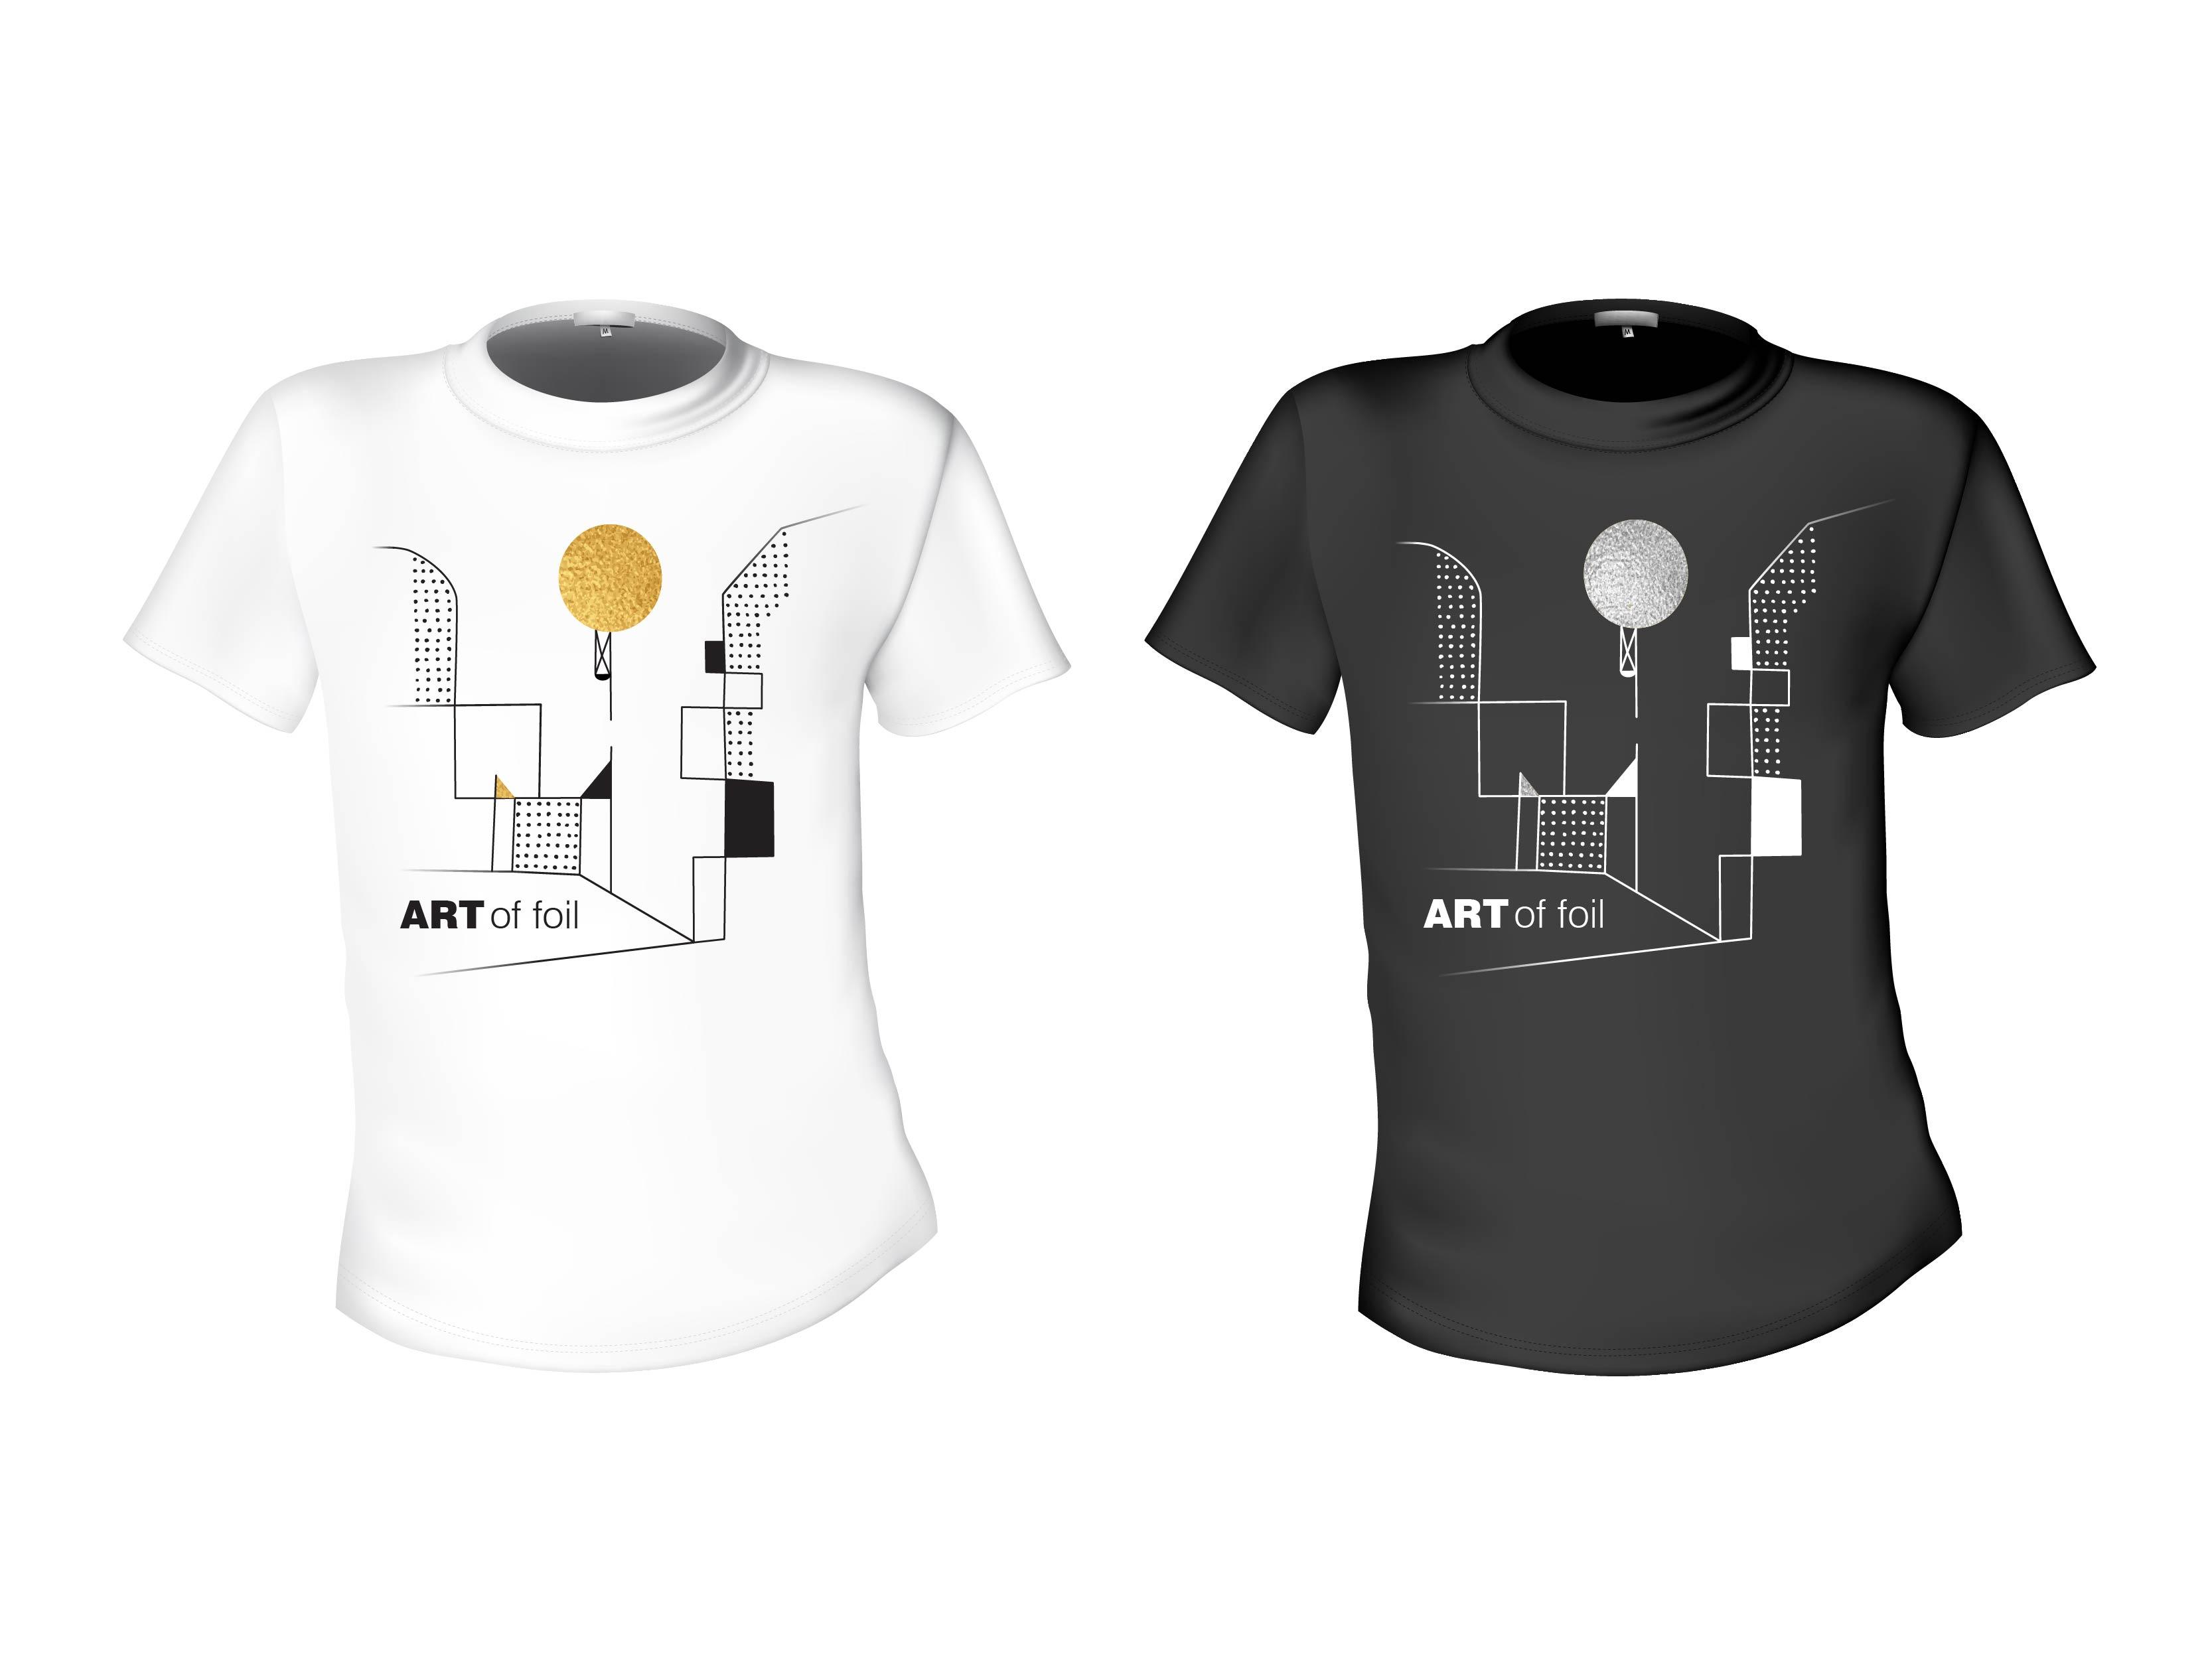 Разработать принт для футболки фото f_1135f665244b2530.jpg